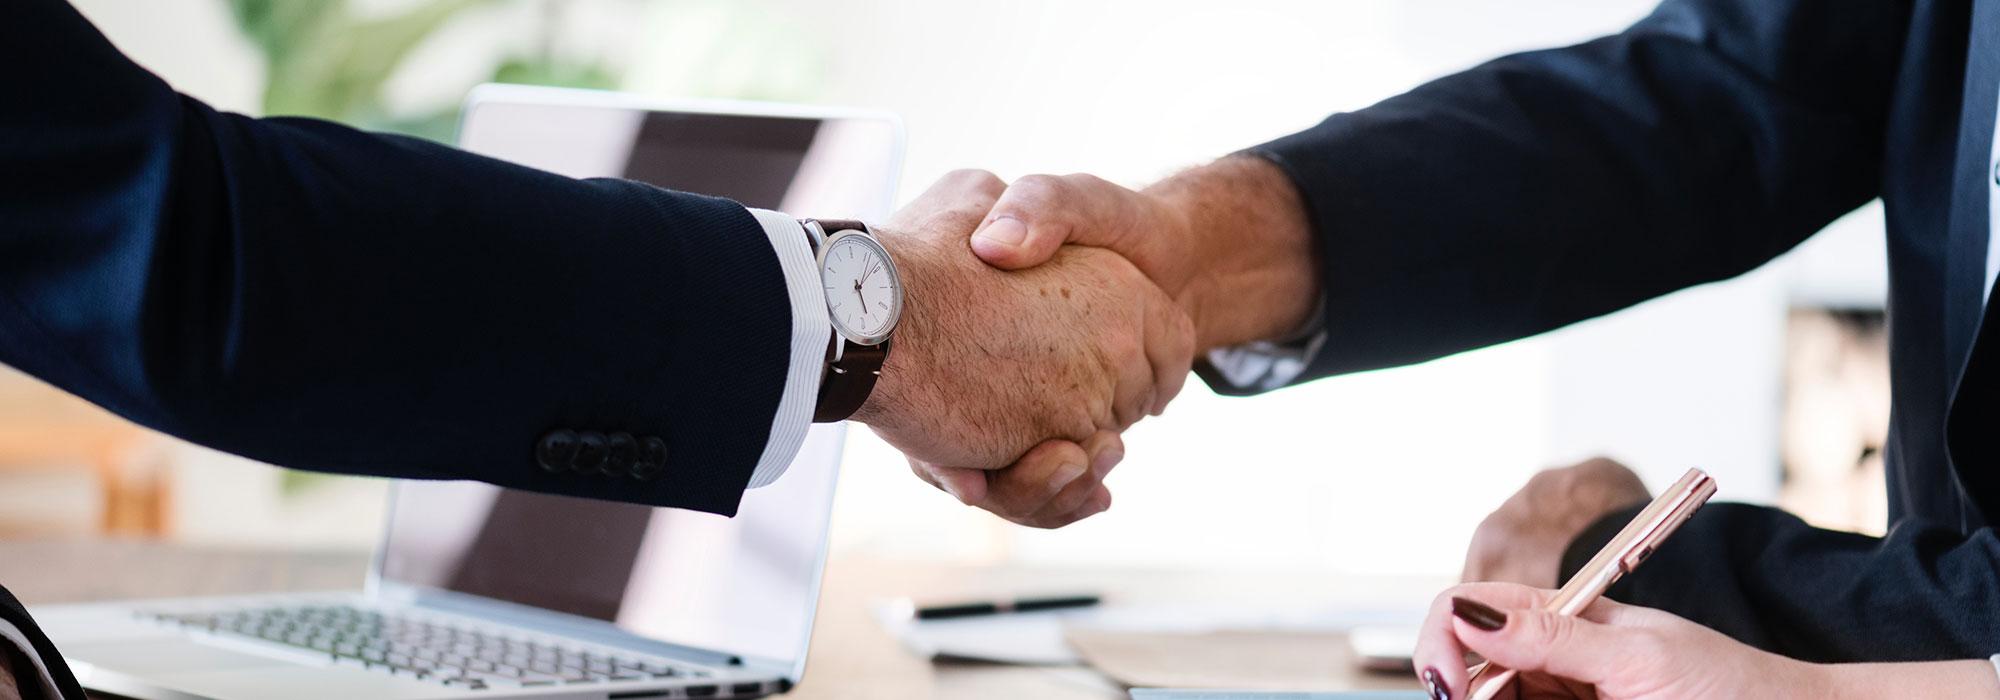 ownership partner disputes